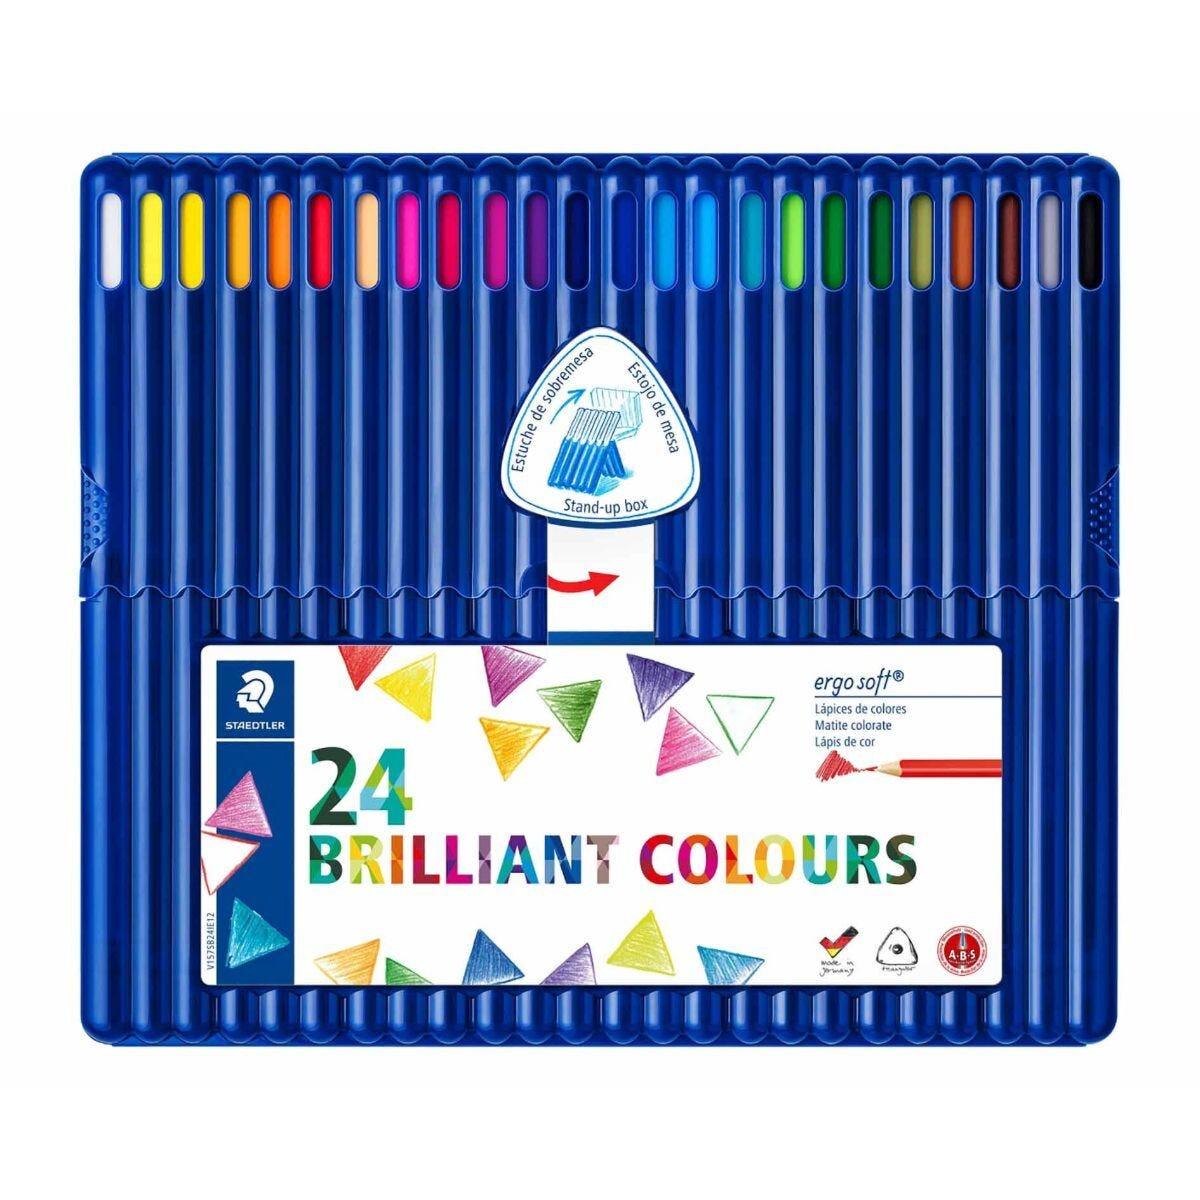 Staedtler Ergosoft Colouring Pencils Pack of 24